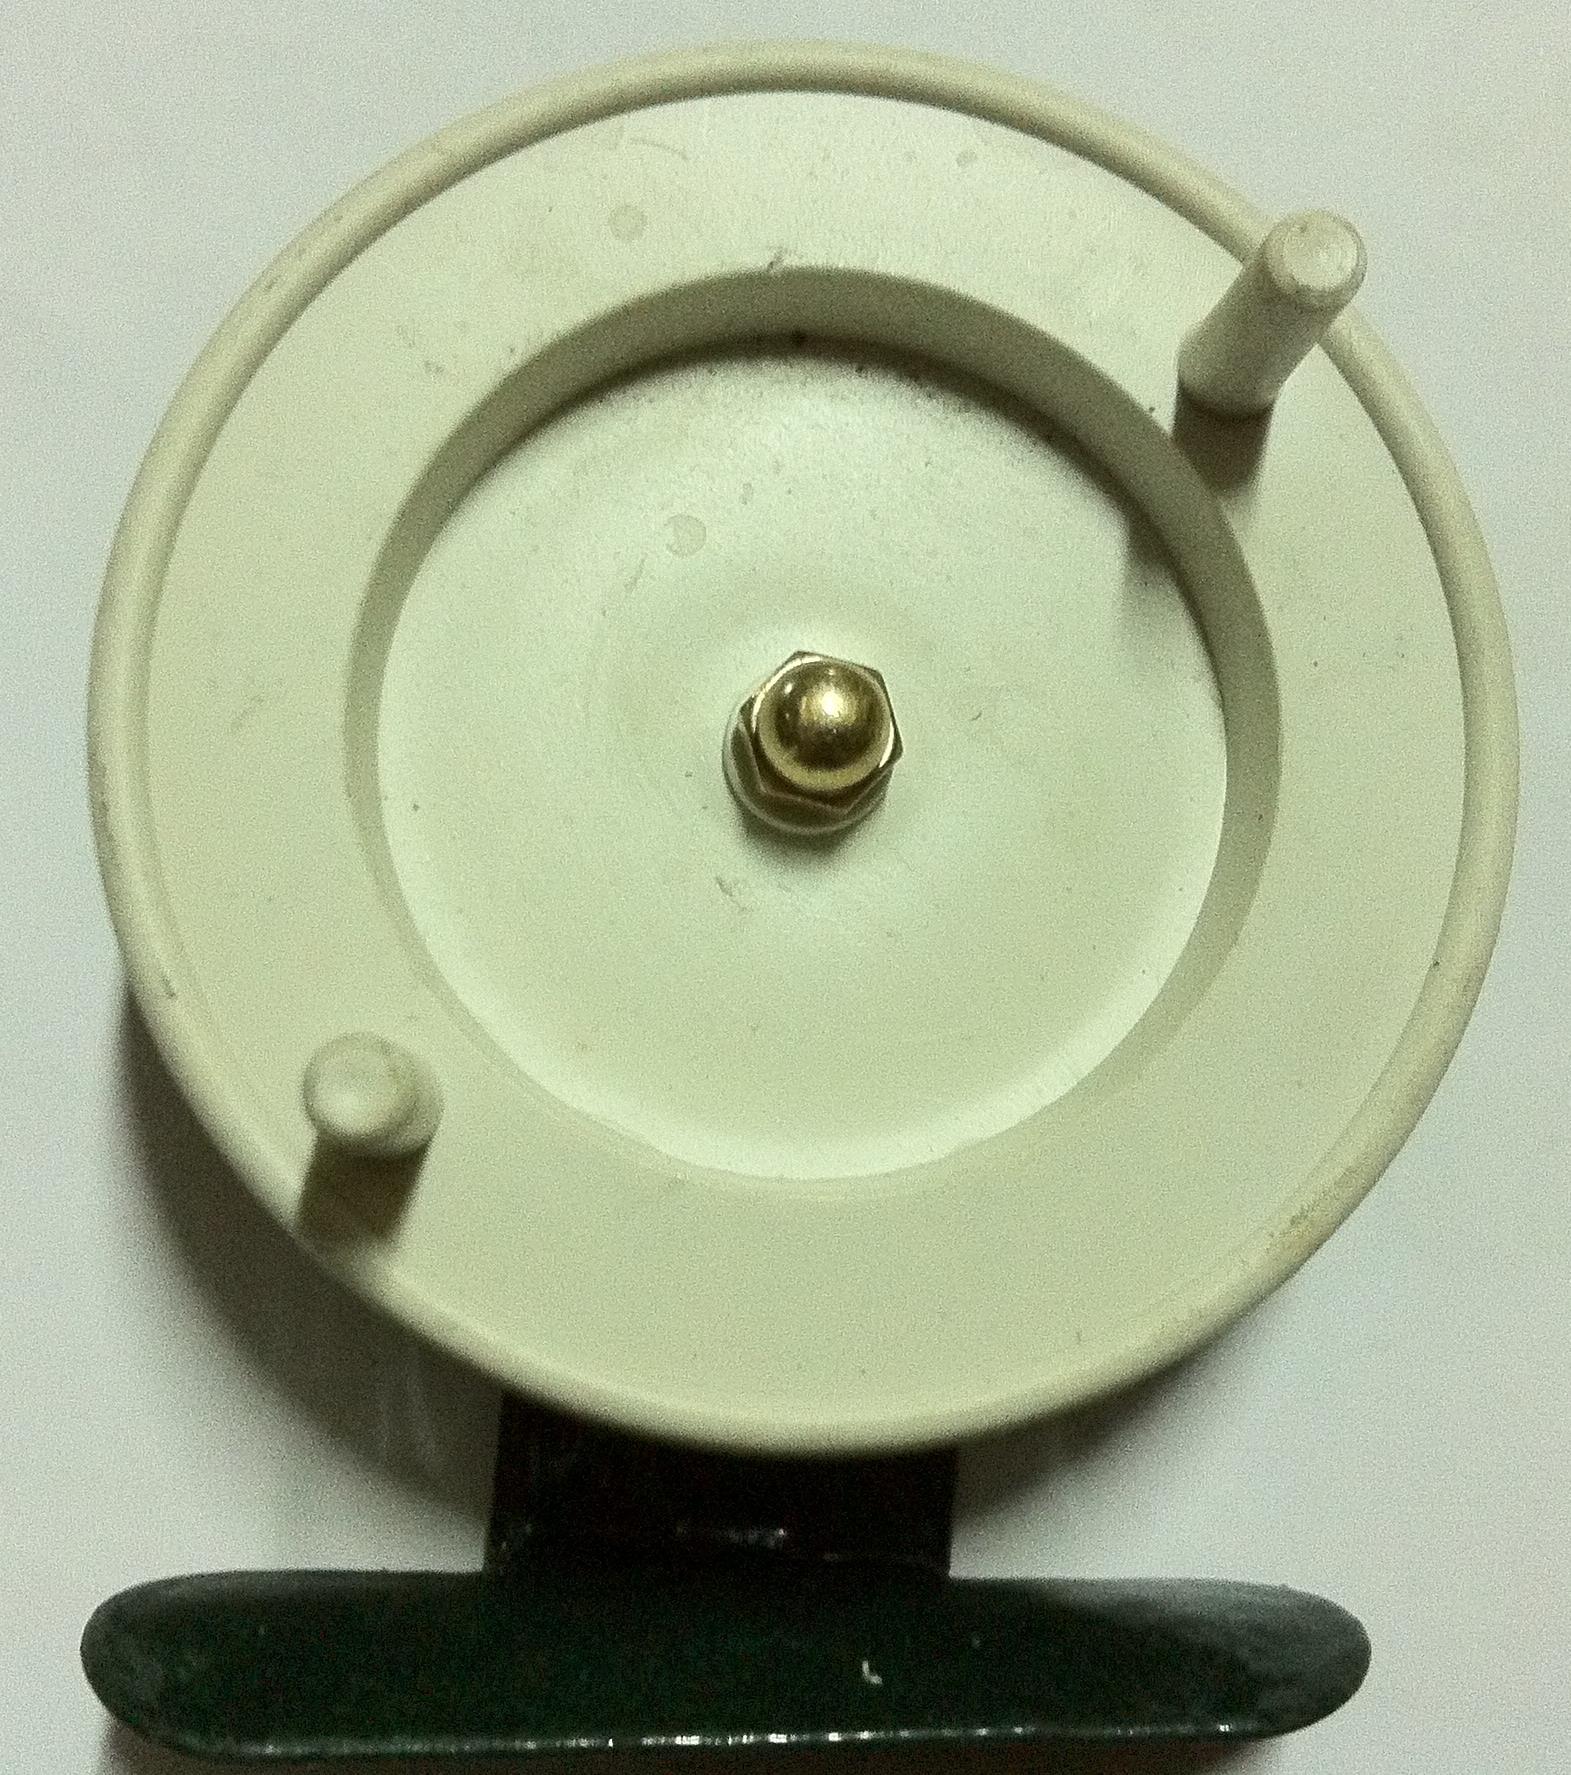 Катушка проводочная SWD №701Проводочные<br>Проводочная катушка SWD 701 имеет широкий <br>спектр применения. Диаметр барабана 65мм.<br>